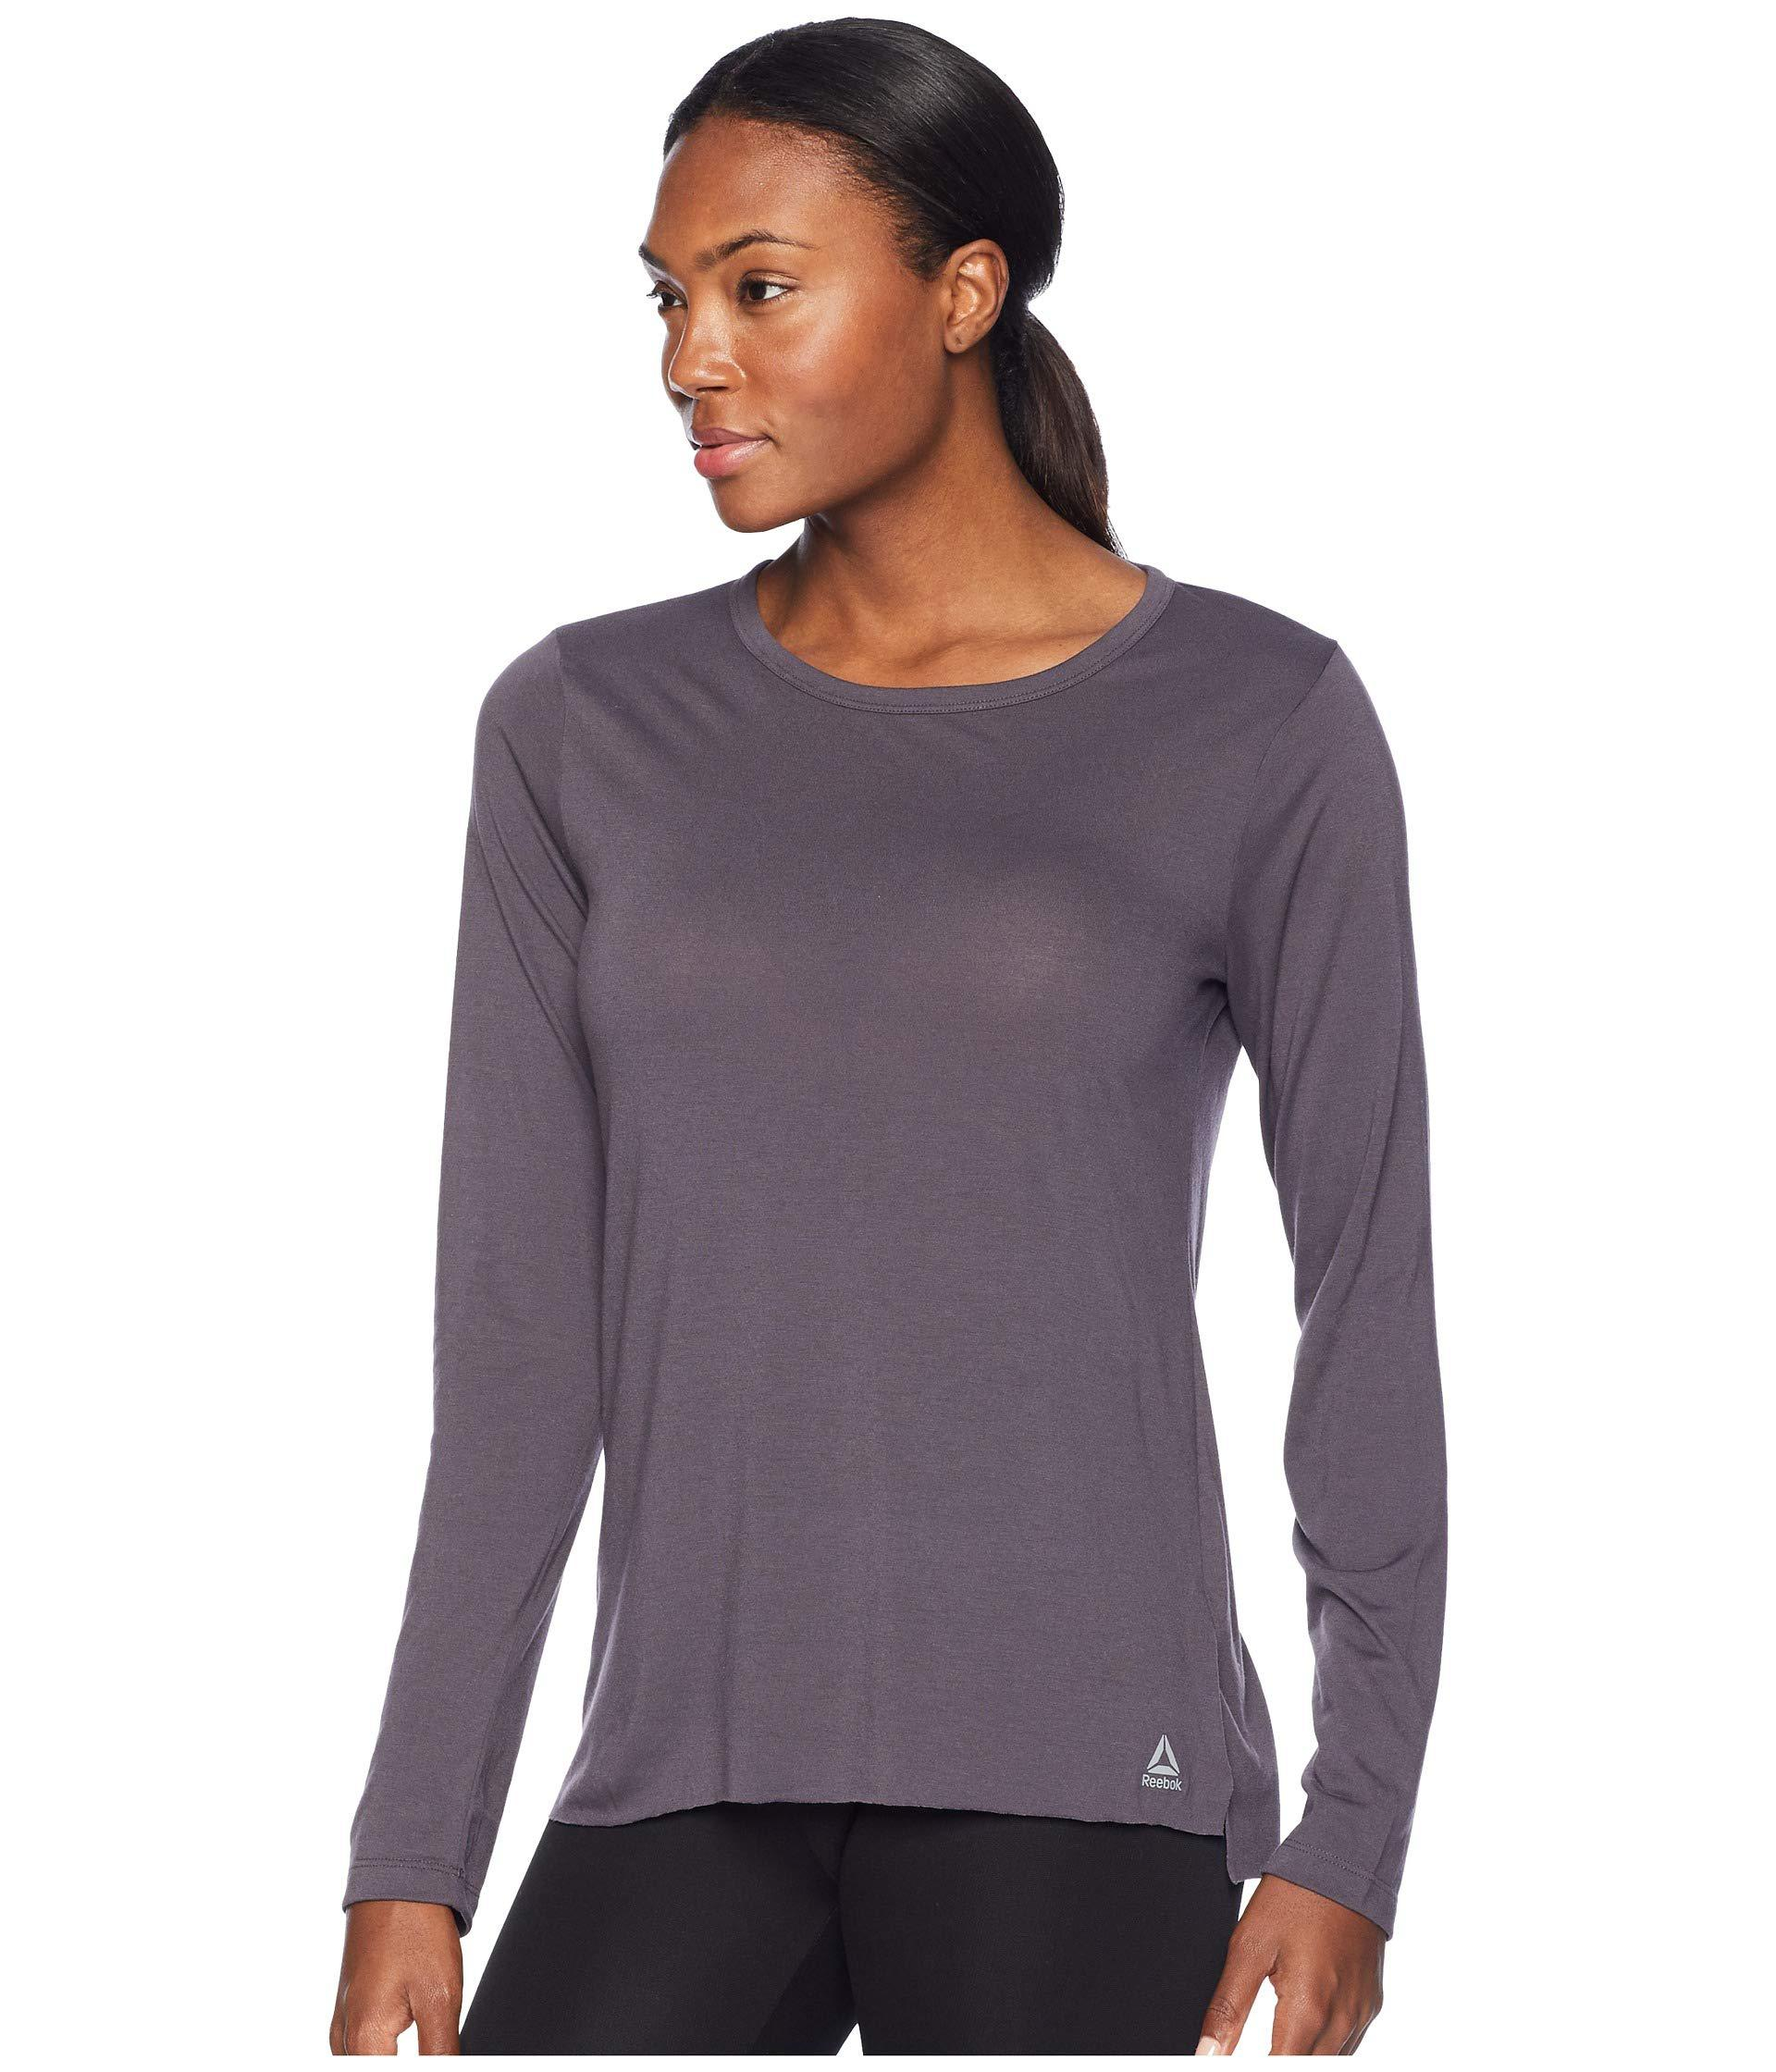 Lyst - Reebok Supremium Long Sleeve Tee (chalk Green) Women s Long Sleeve  Pullover in Gray 18d7a7edd